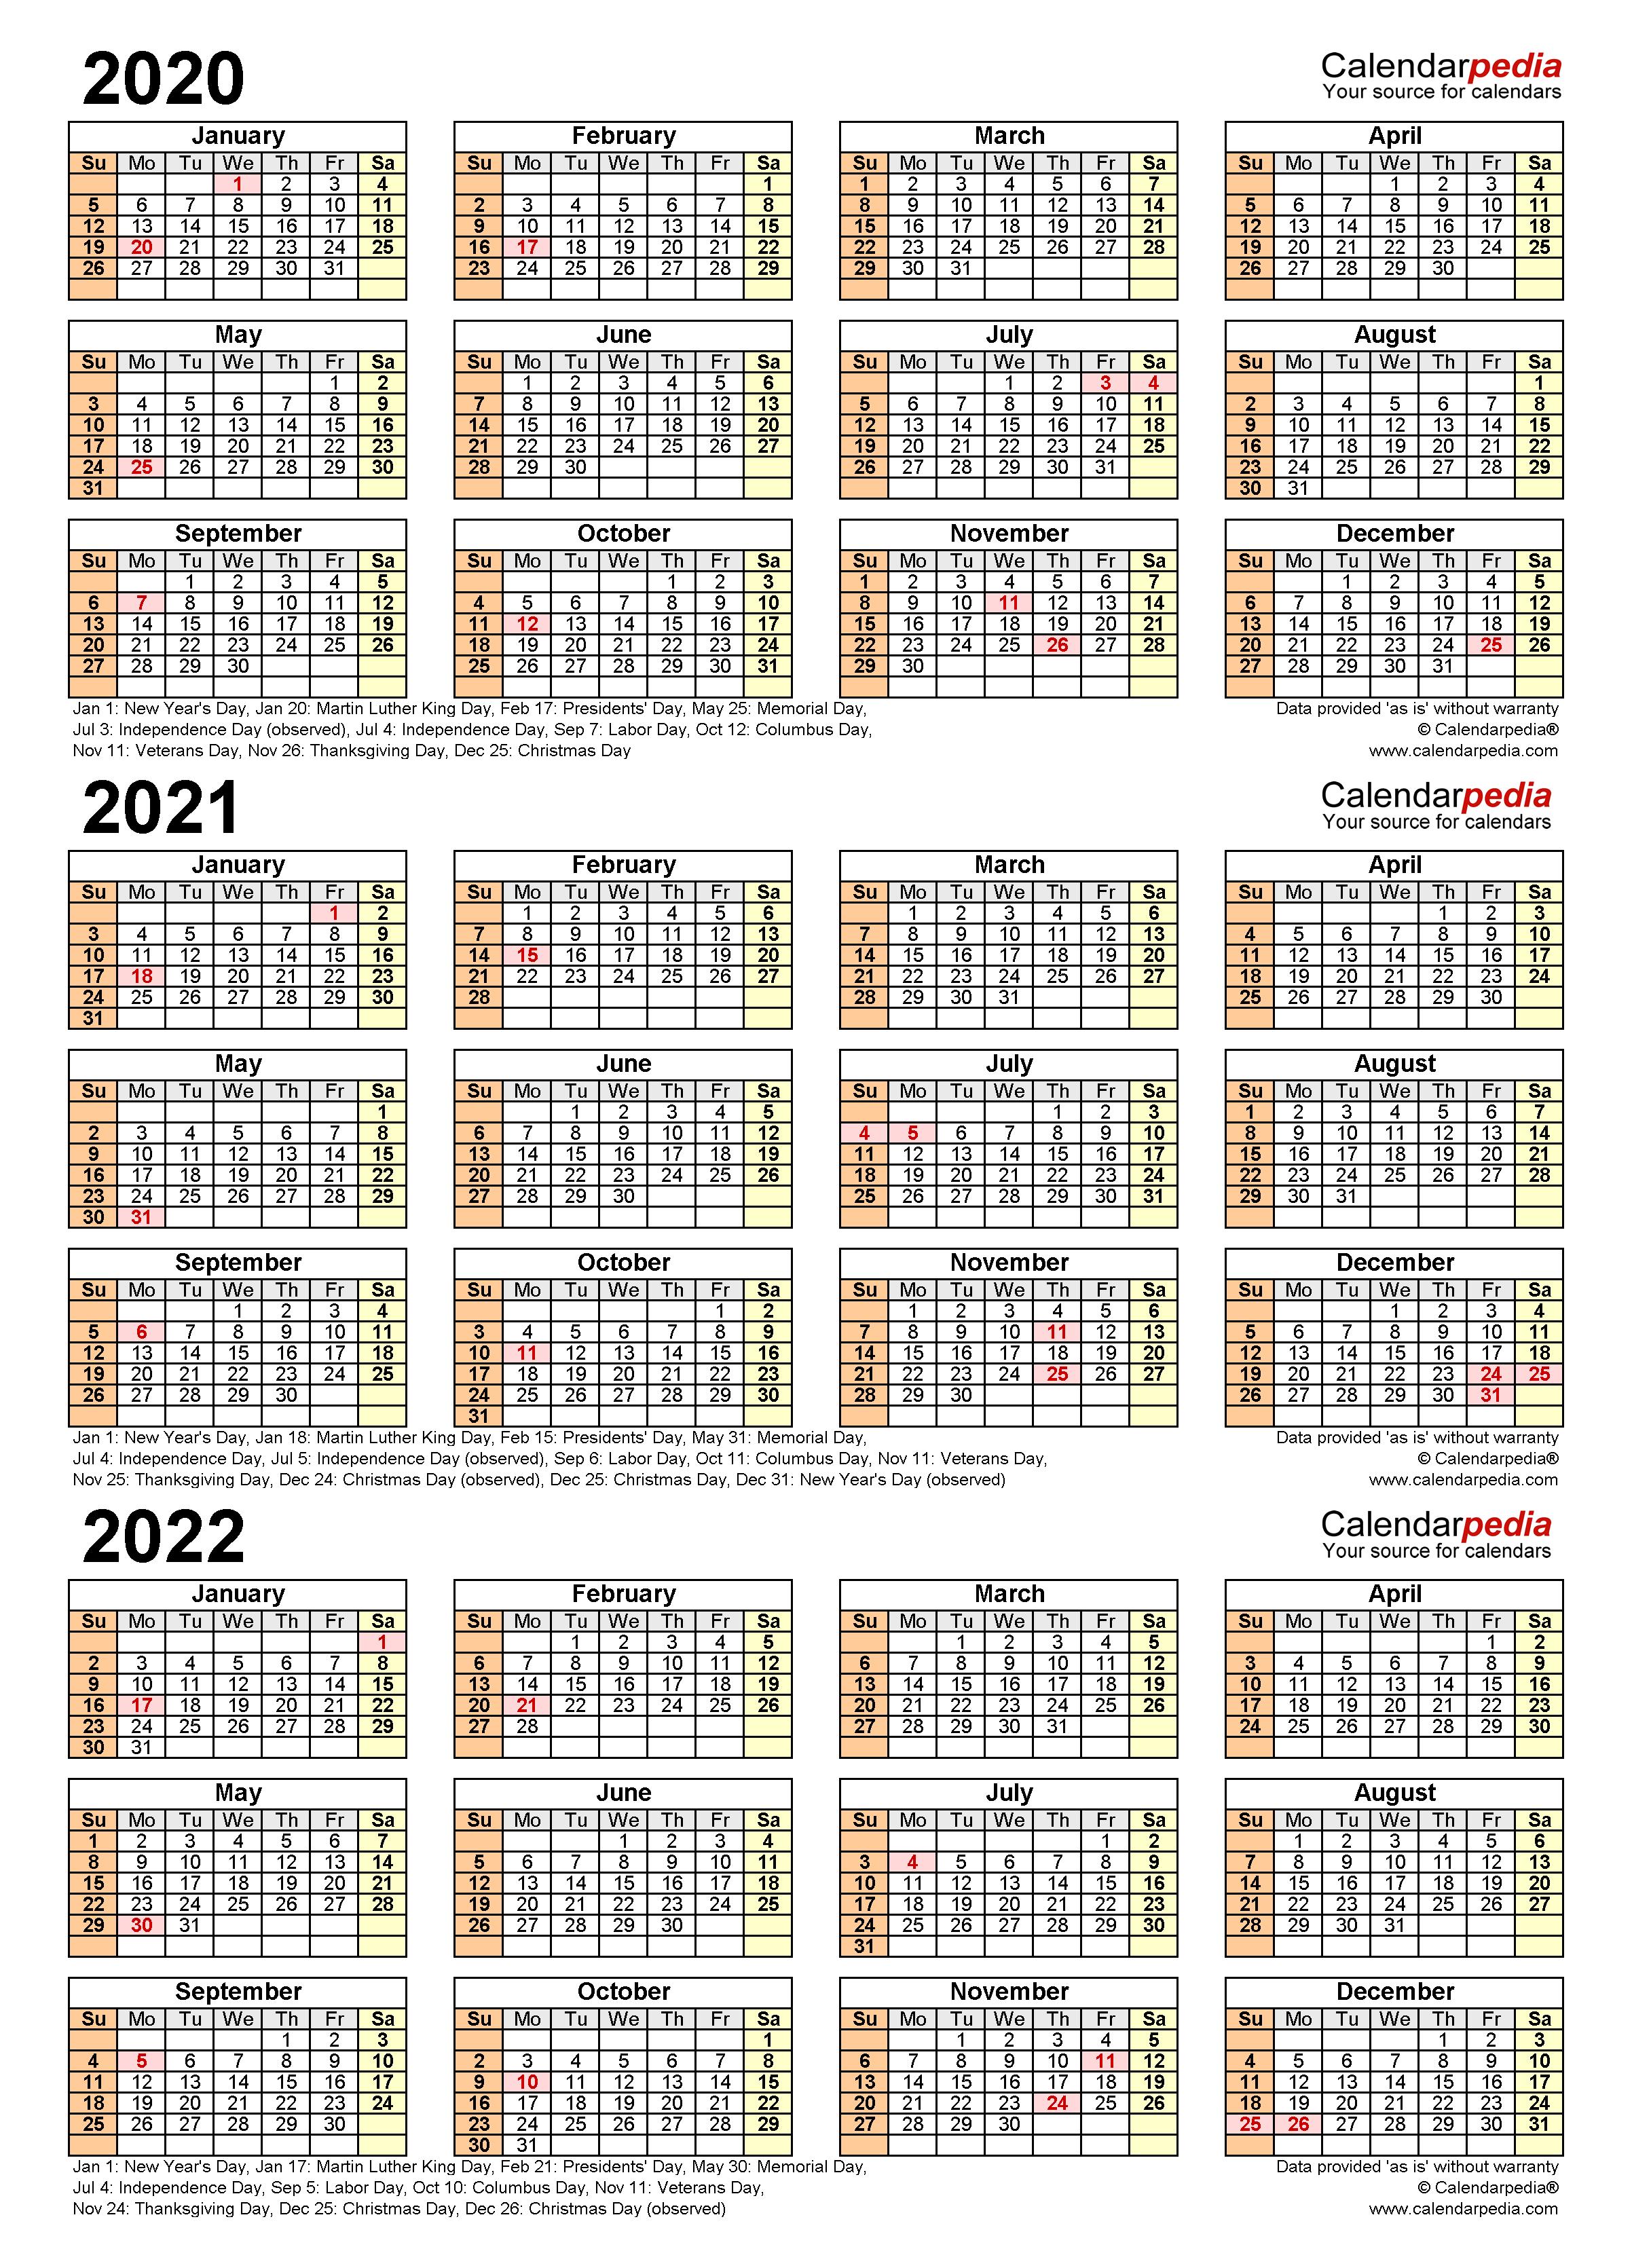 2020-2022 Three Year Calendar - Free Printable Pdf Templates in 3 Year Calendar 2020 To 2023